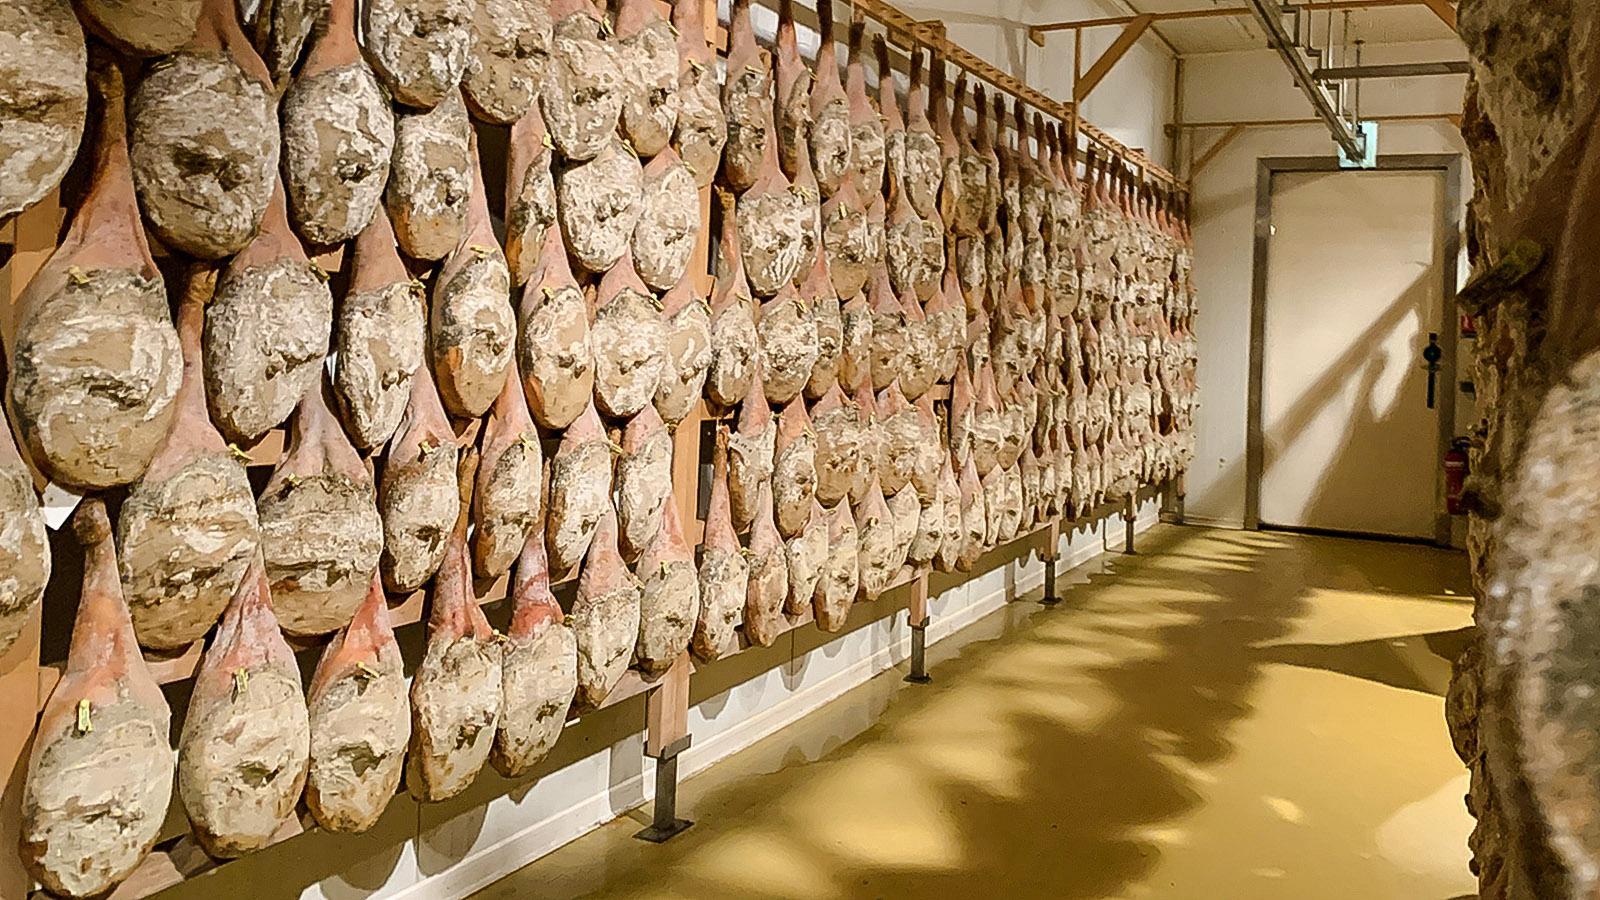 Schinkenparadies des Kintoa: der Trockenkeller in Les Aldudes. Foto: Hilke Maunder